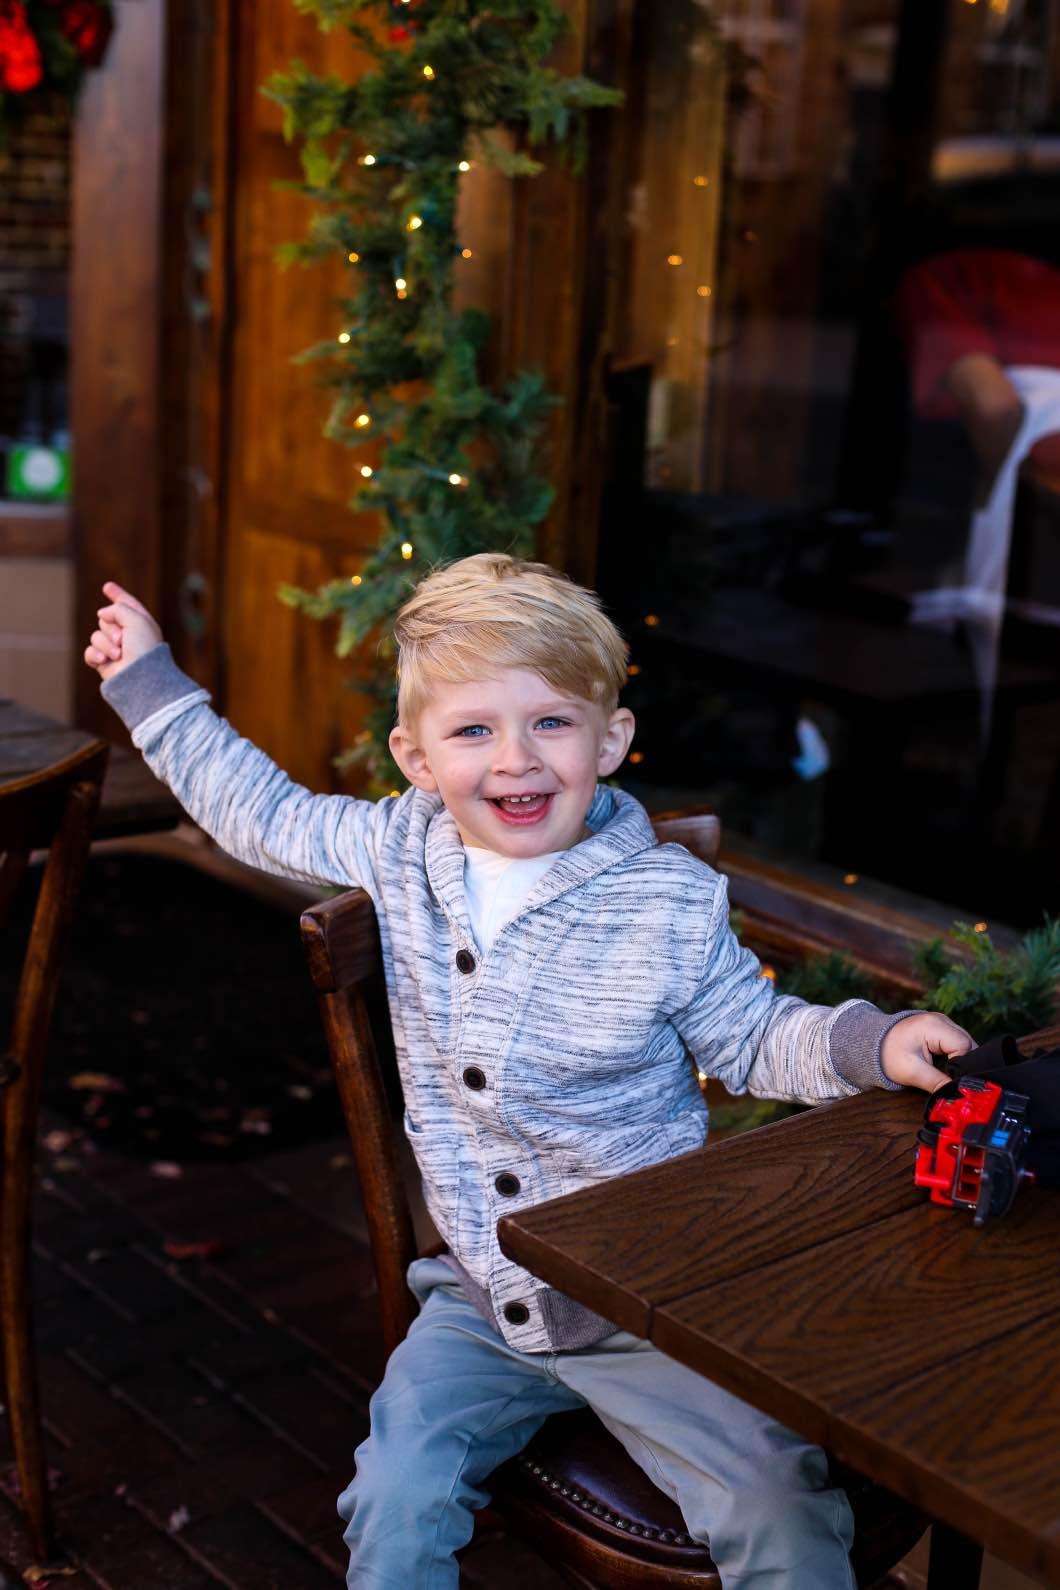 christmastoddlerfashionoshkosh - Baby and Toddler Holiday Outfits with OshKosh B'gosh by Atlanta style blogger Happily Hughes